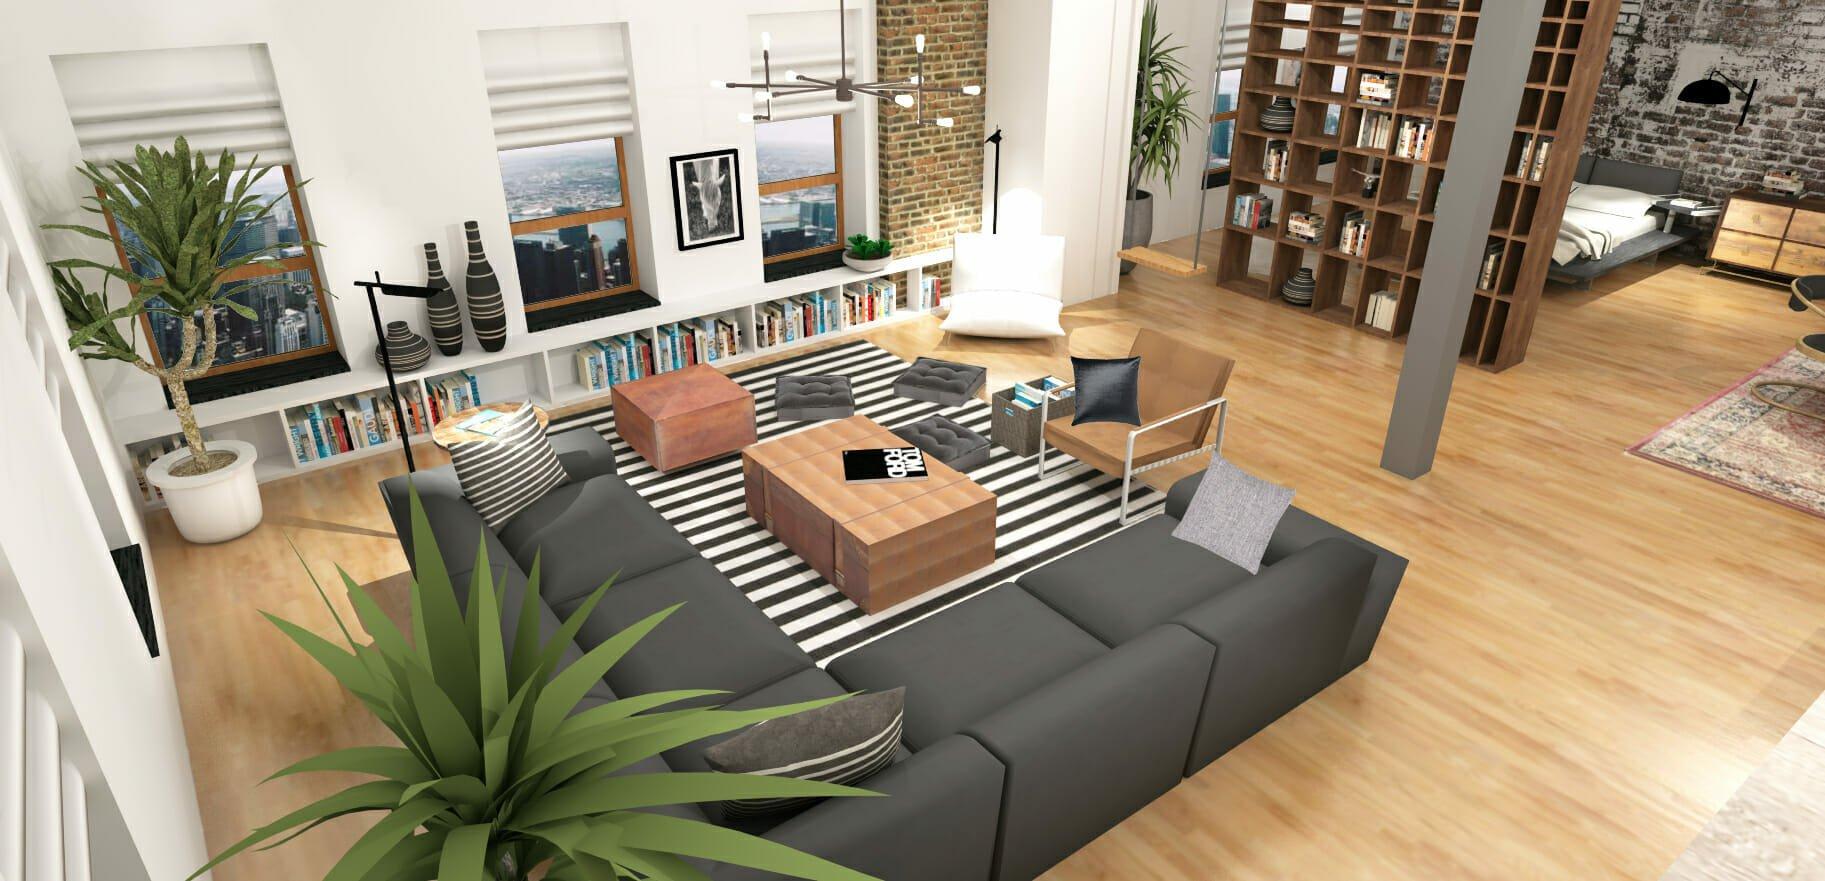 Eclectic NYC Loft Interior Design